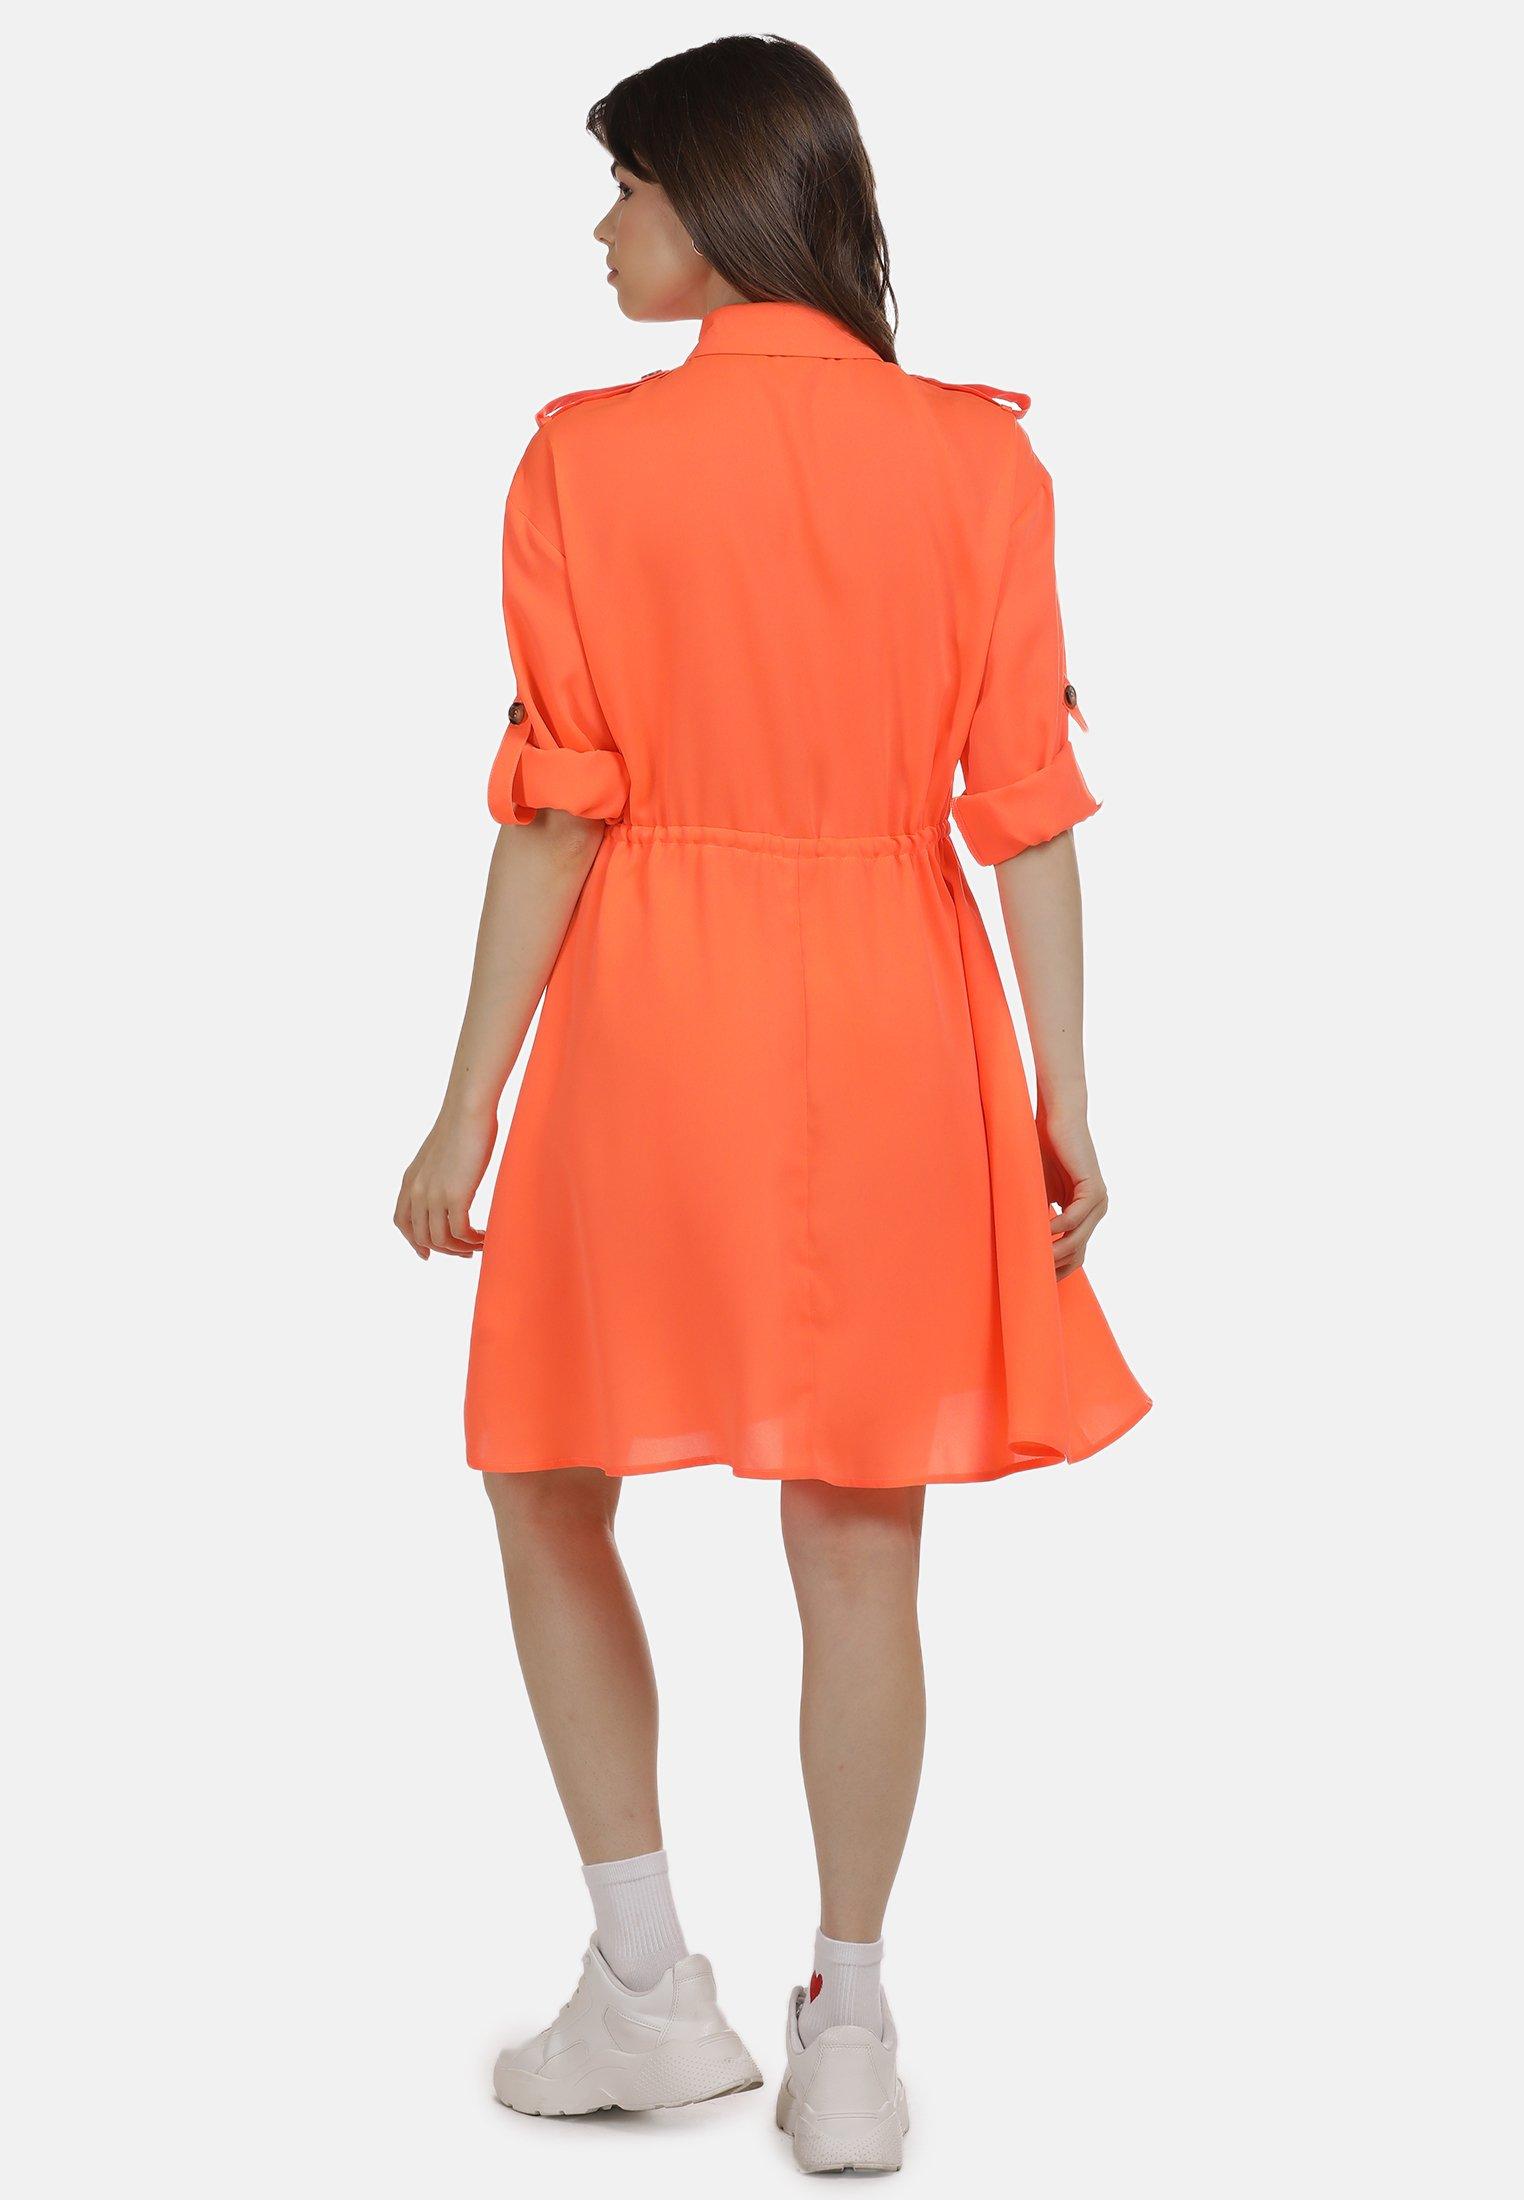 New And Fashion Women's Clothing myMo KLEID Shirt dress neon orange aRCRROpmg